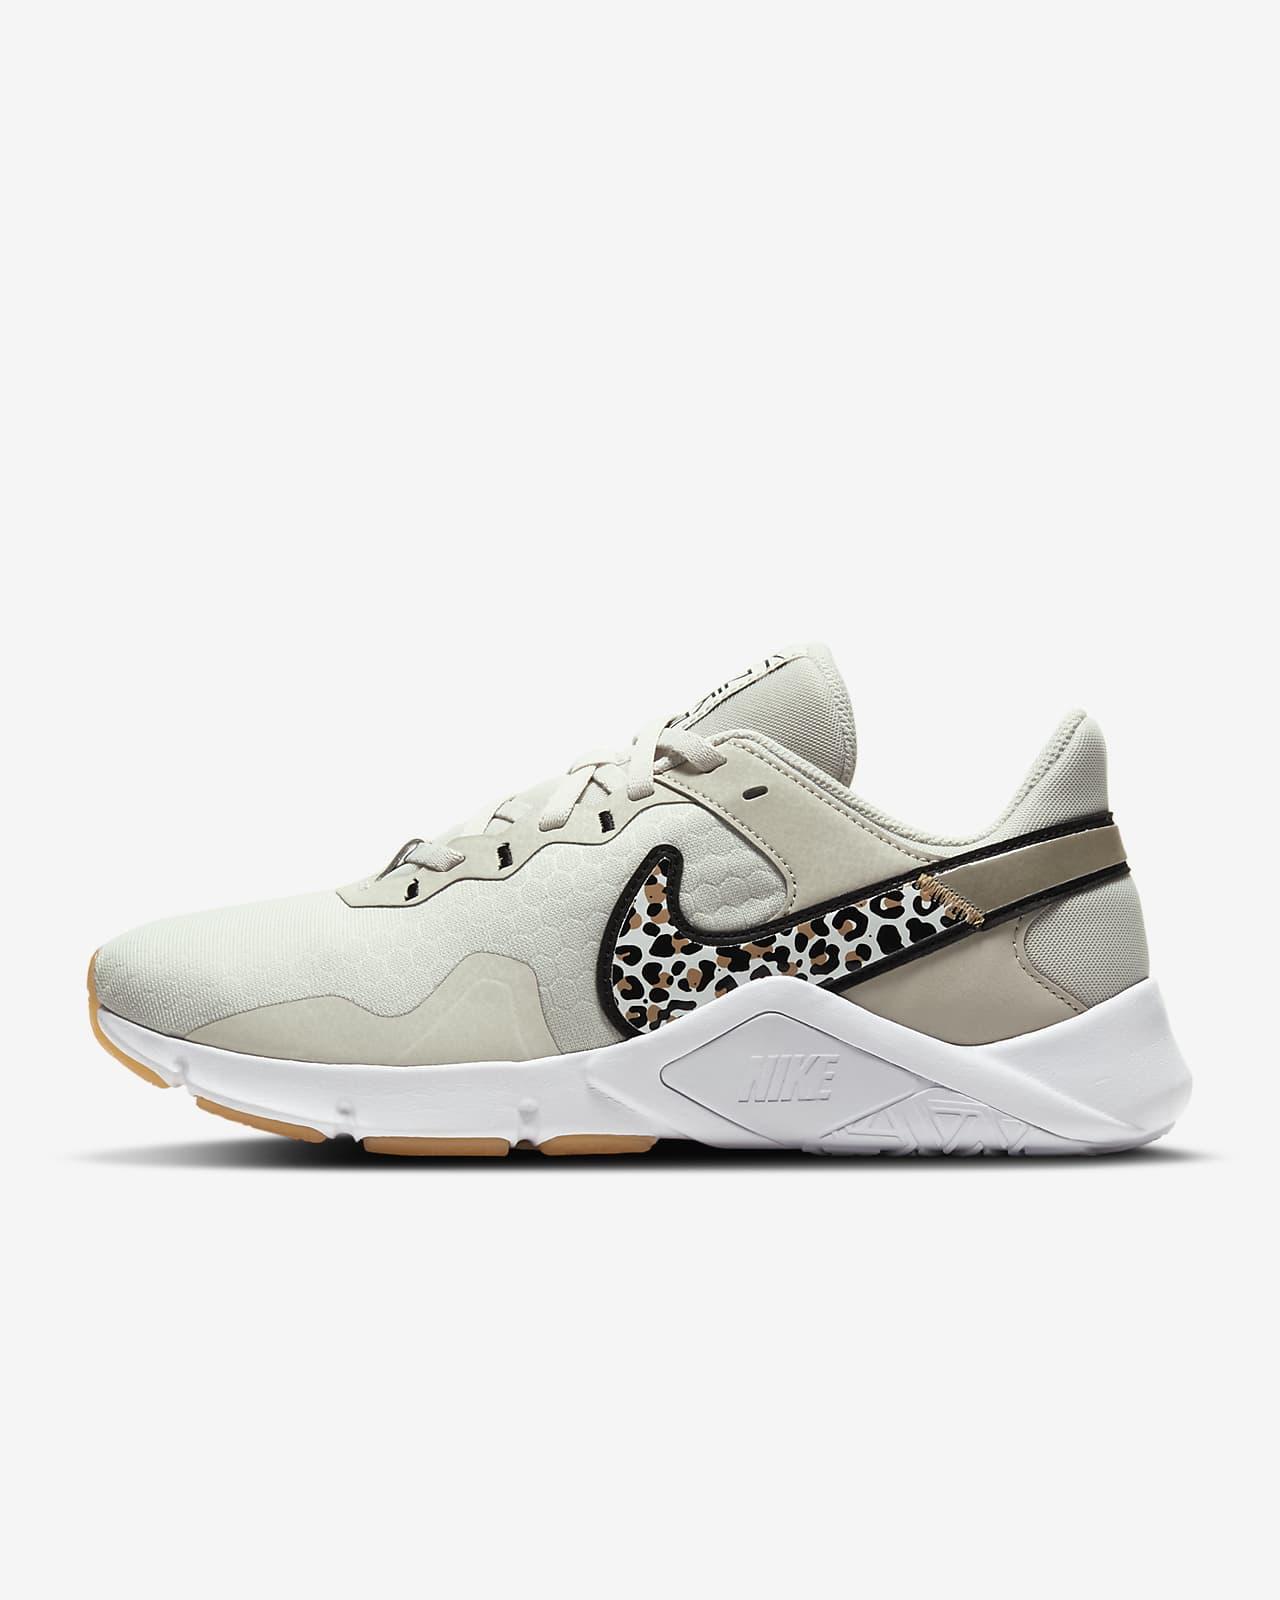 Calzado de entrenamiento para mujer Nike Legend Essential 2 Premium